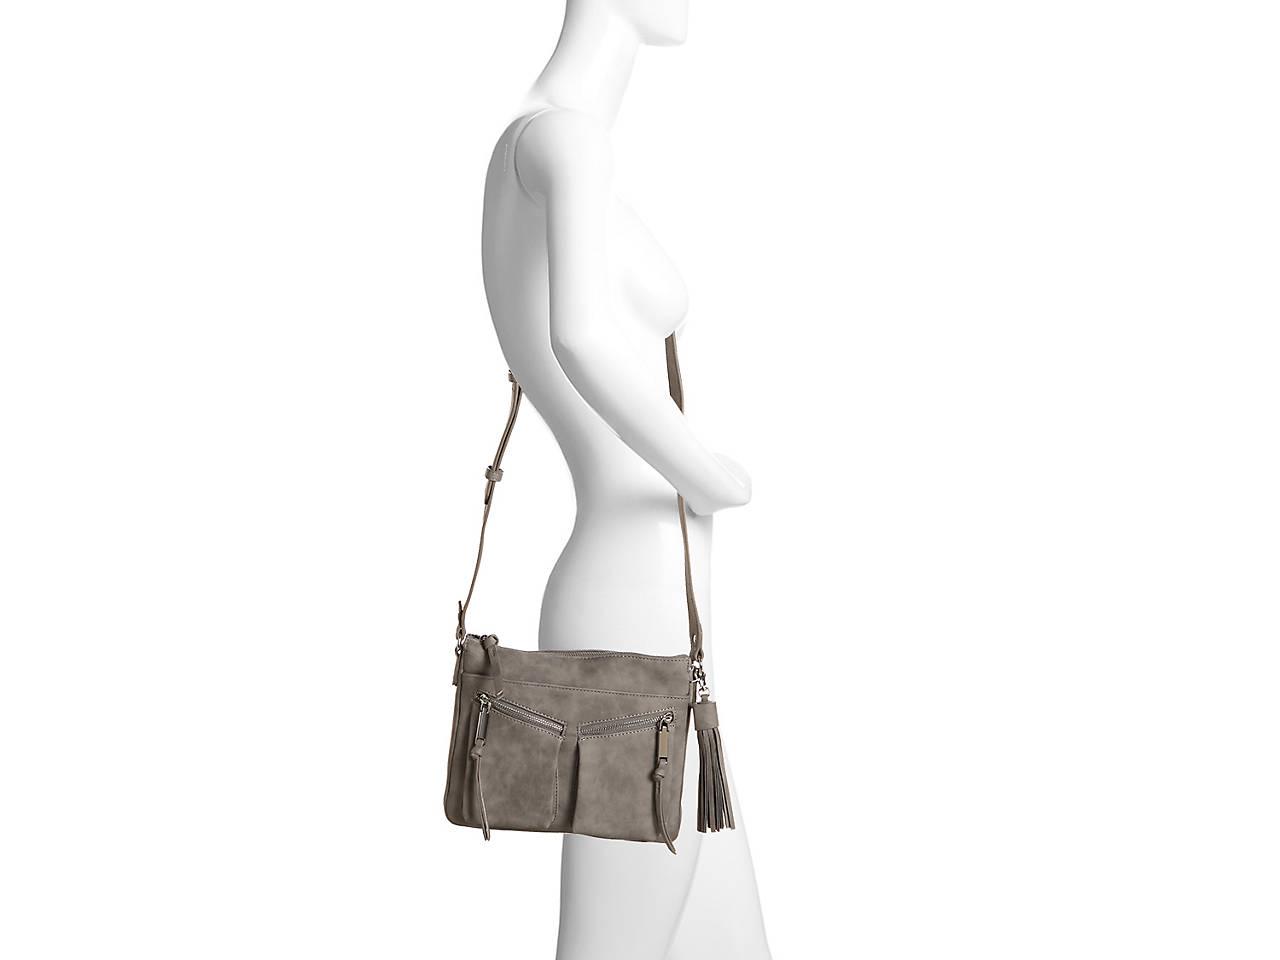 b7aa67a99cea Violet Ray Raven Tassel Crossbody Bag Women s Handbags   Accessories ...